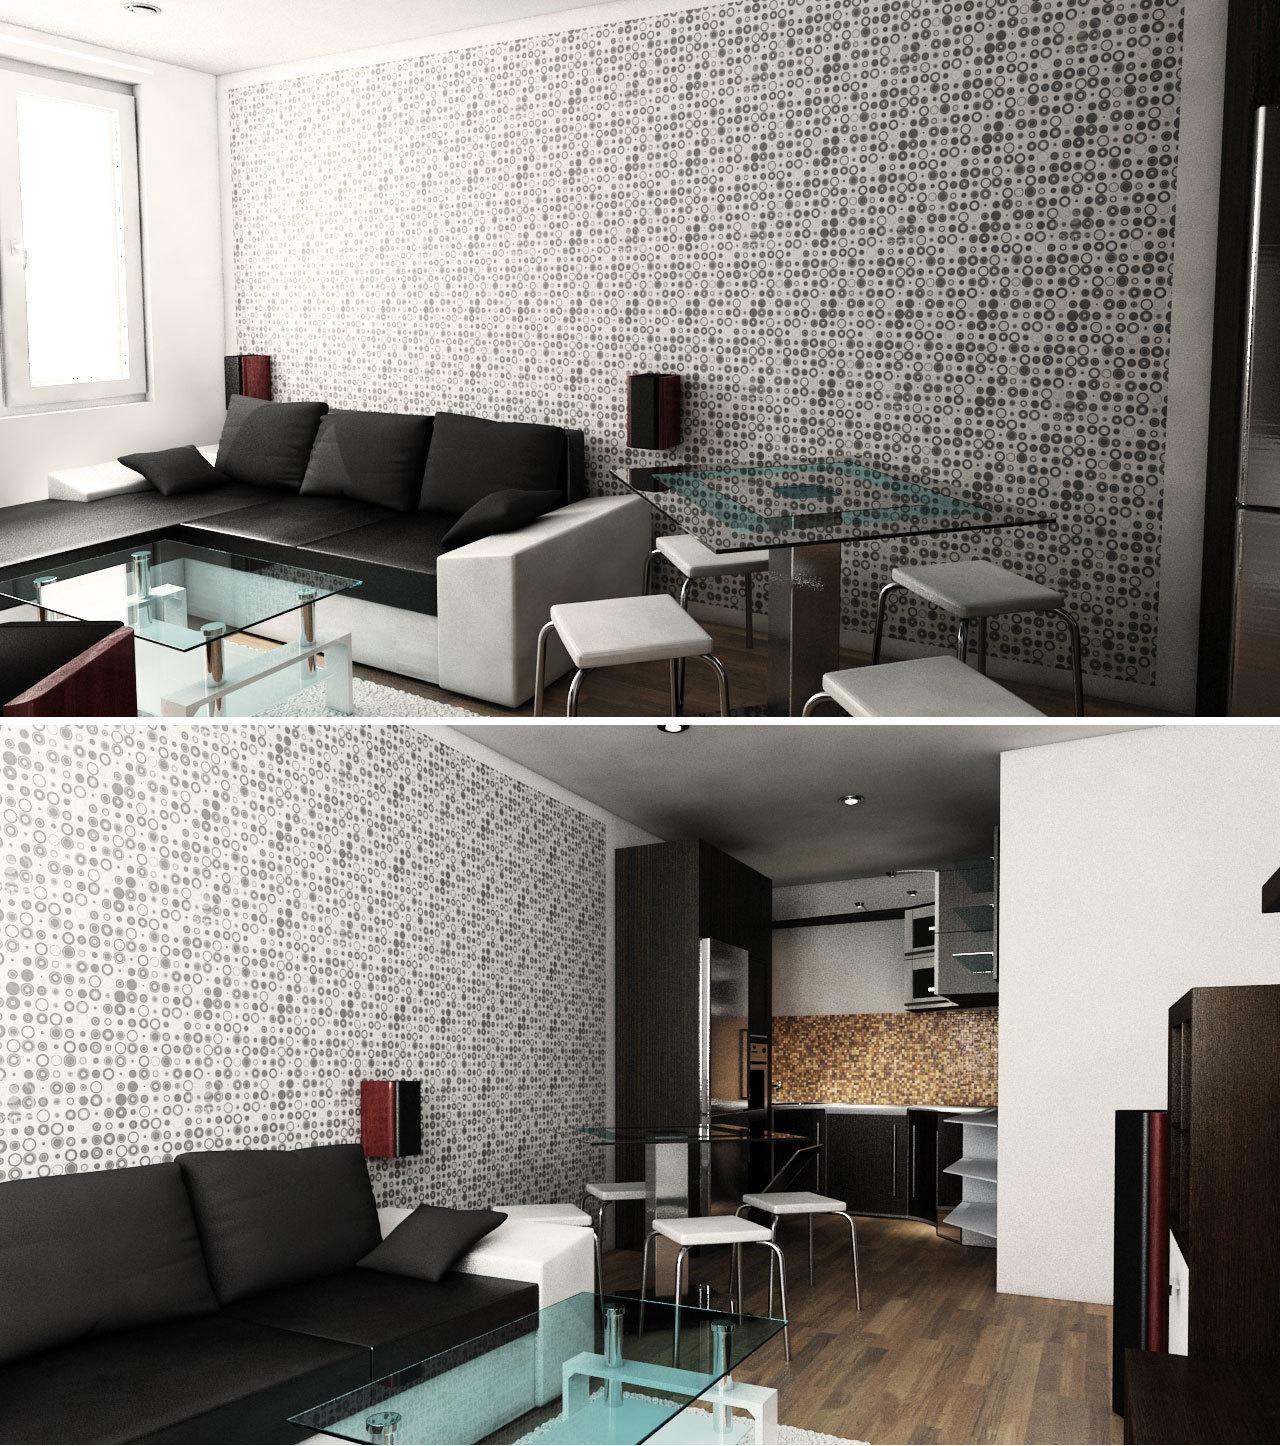 Shano interior design 1 76aeb2f4 8x0y